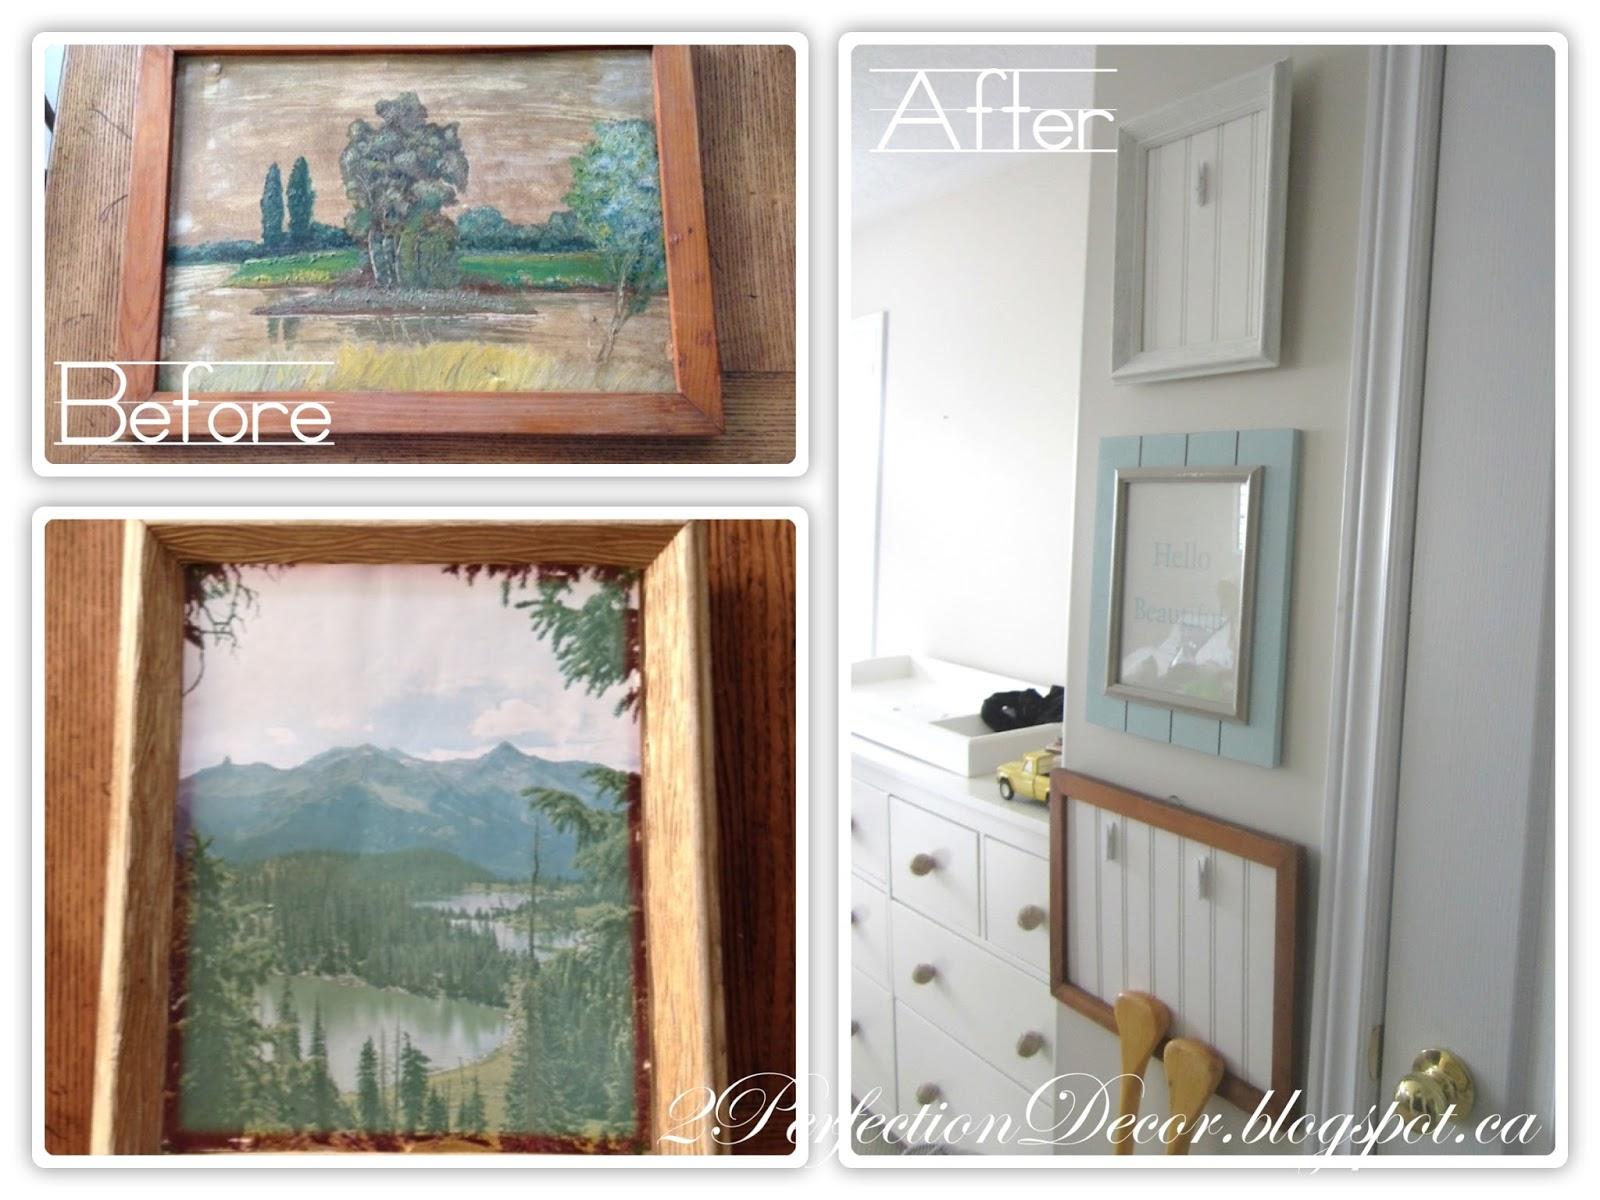 2Perfection Decor: Vintage Frames DIY